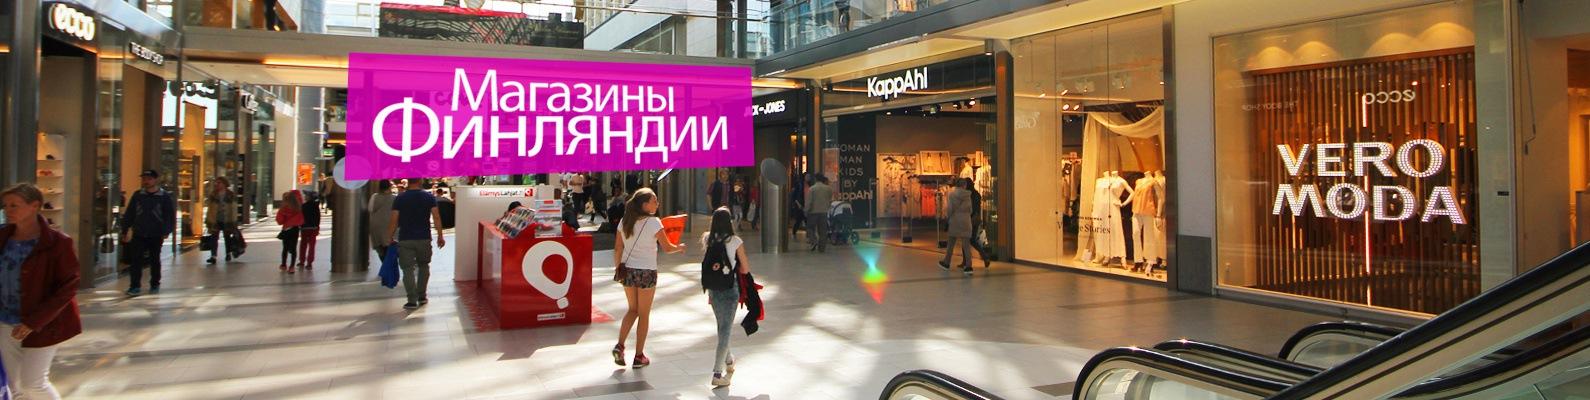 MakeUpcomua  Интернет магазин парфюмерии и косметики